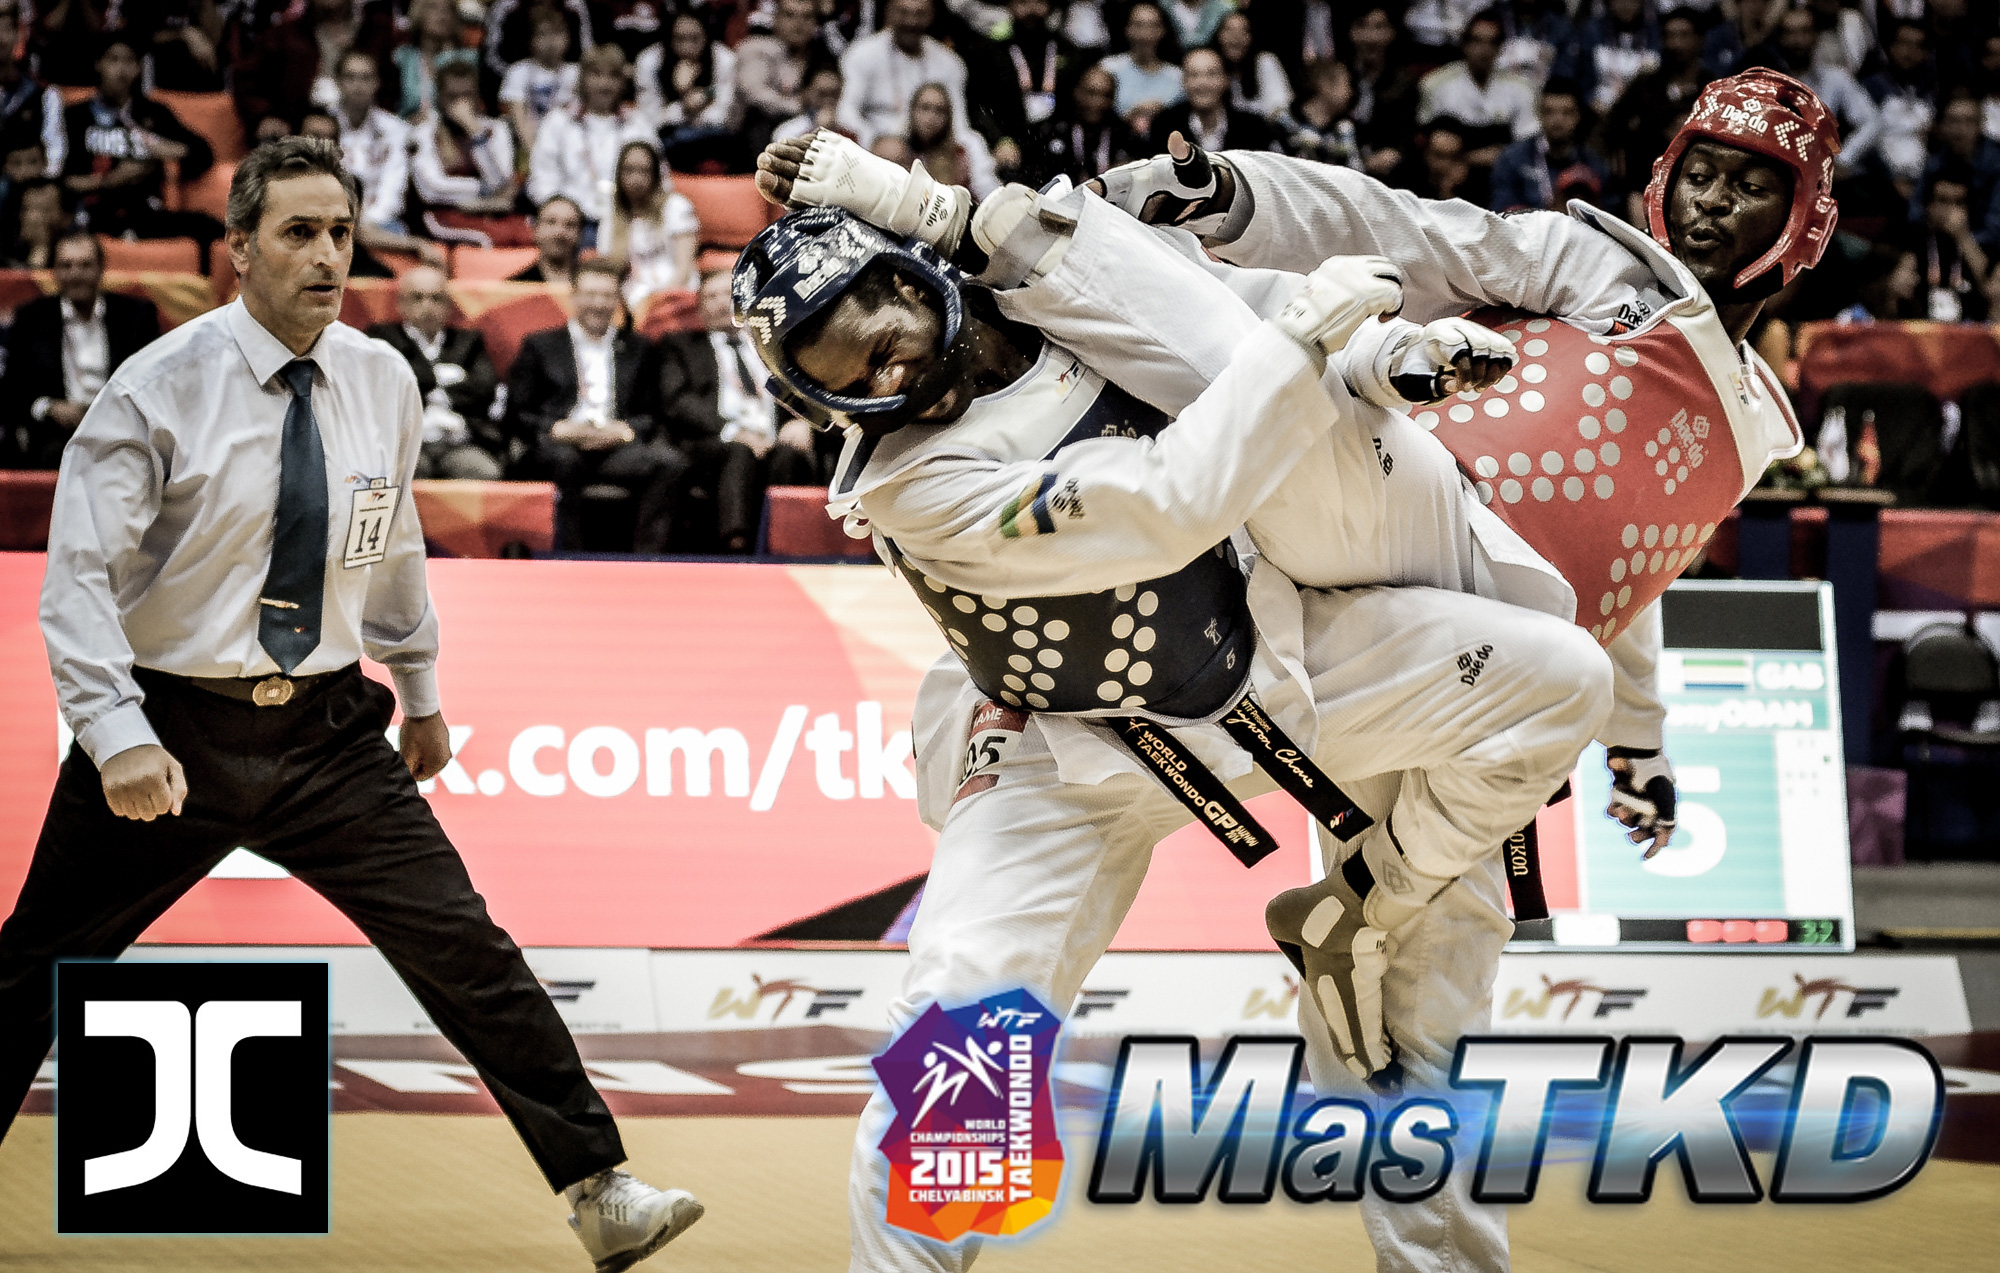 13_Mundial-Taekwondo_JCalicu-Seleccion-Mejor-Foto